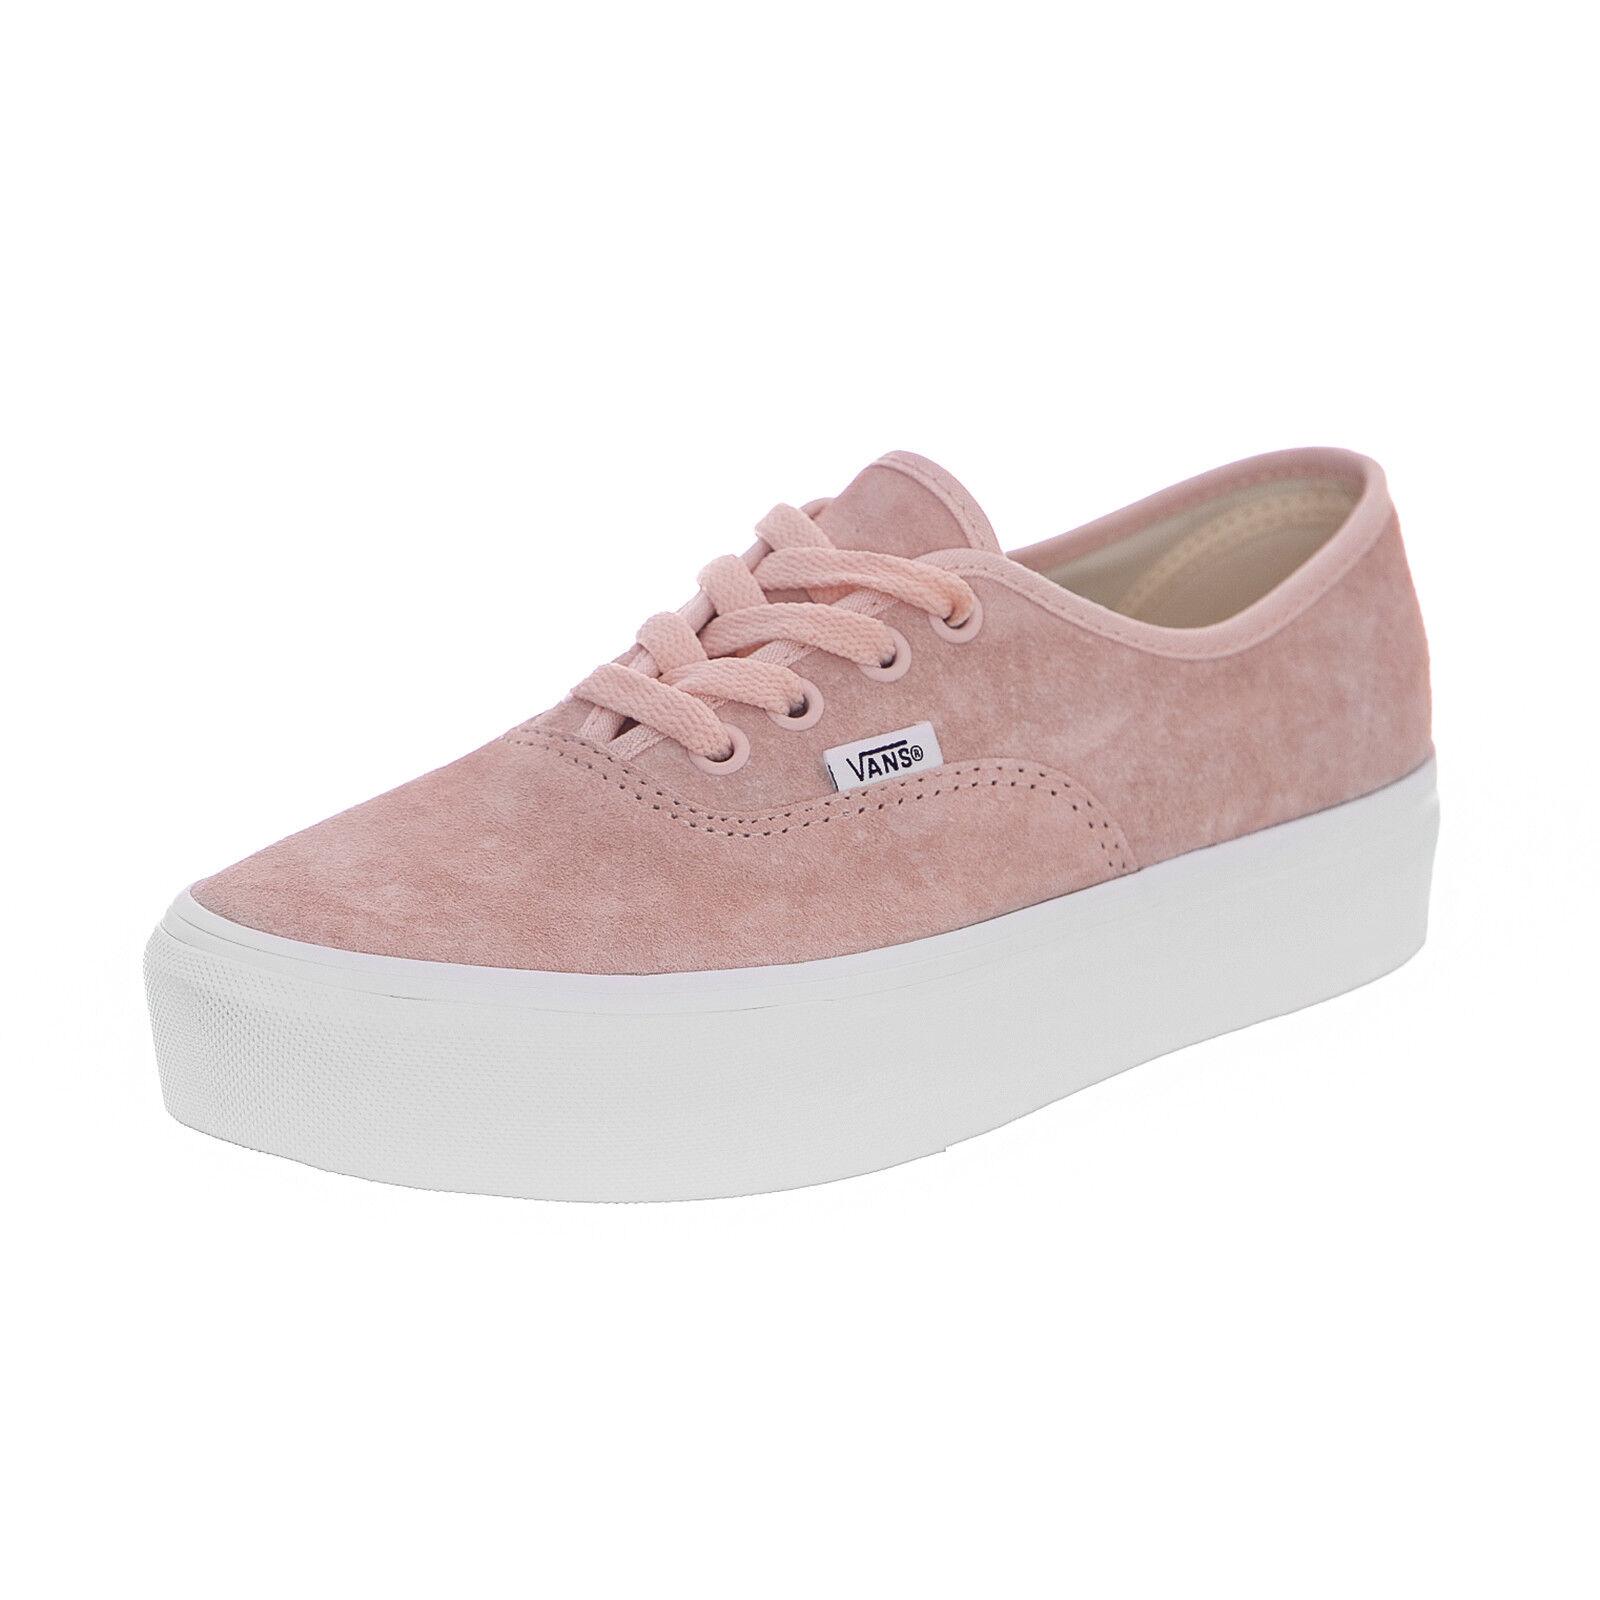 Vans Sneakers Ua Authentic Platform (Pig Suede) - Pale Dogwood pink